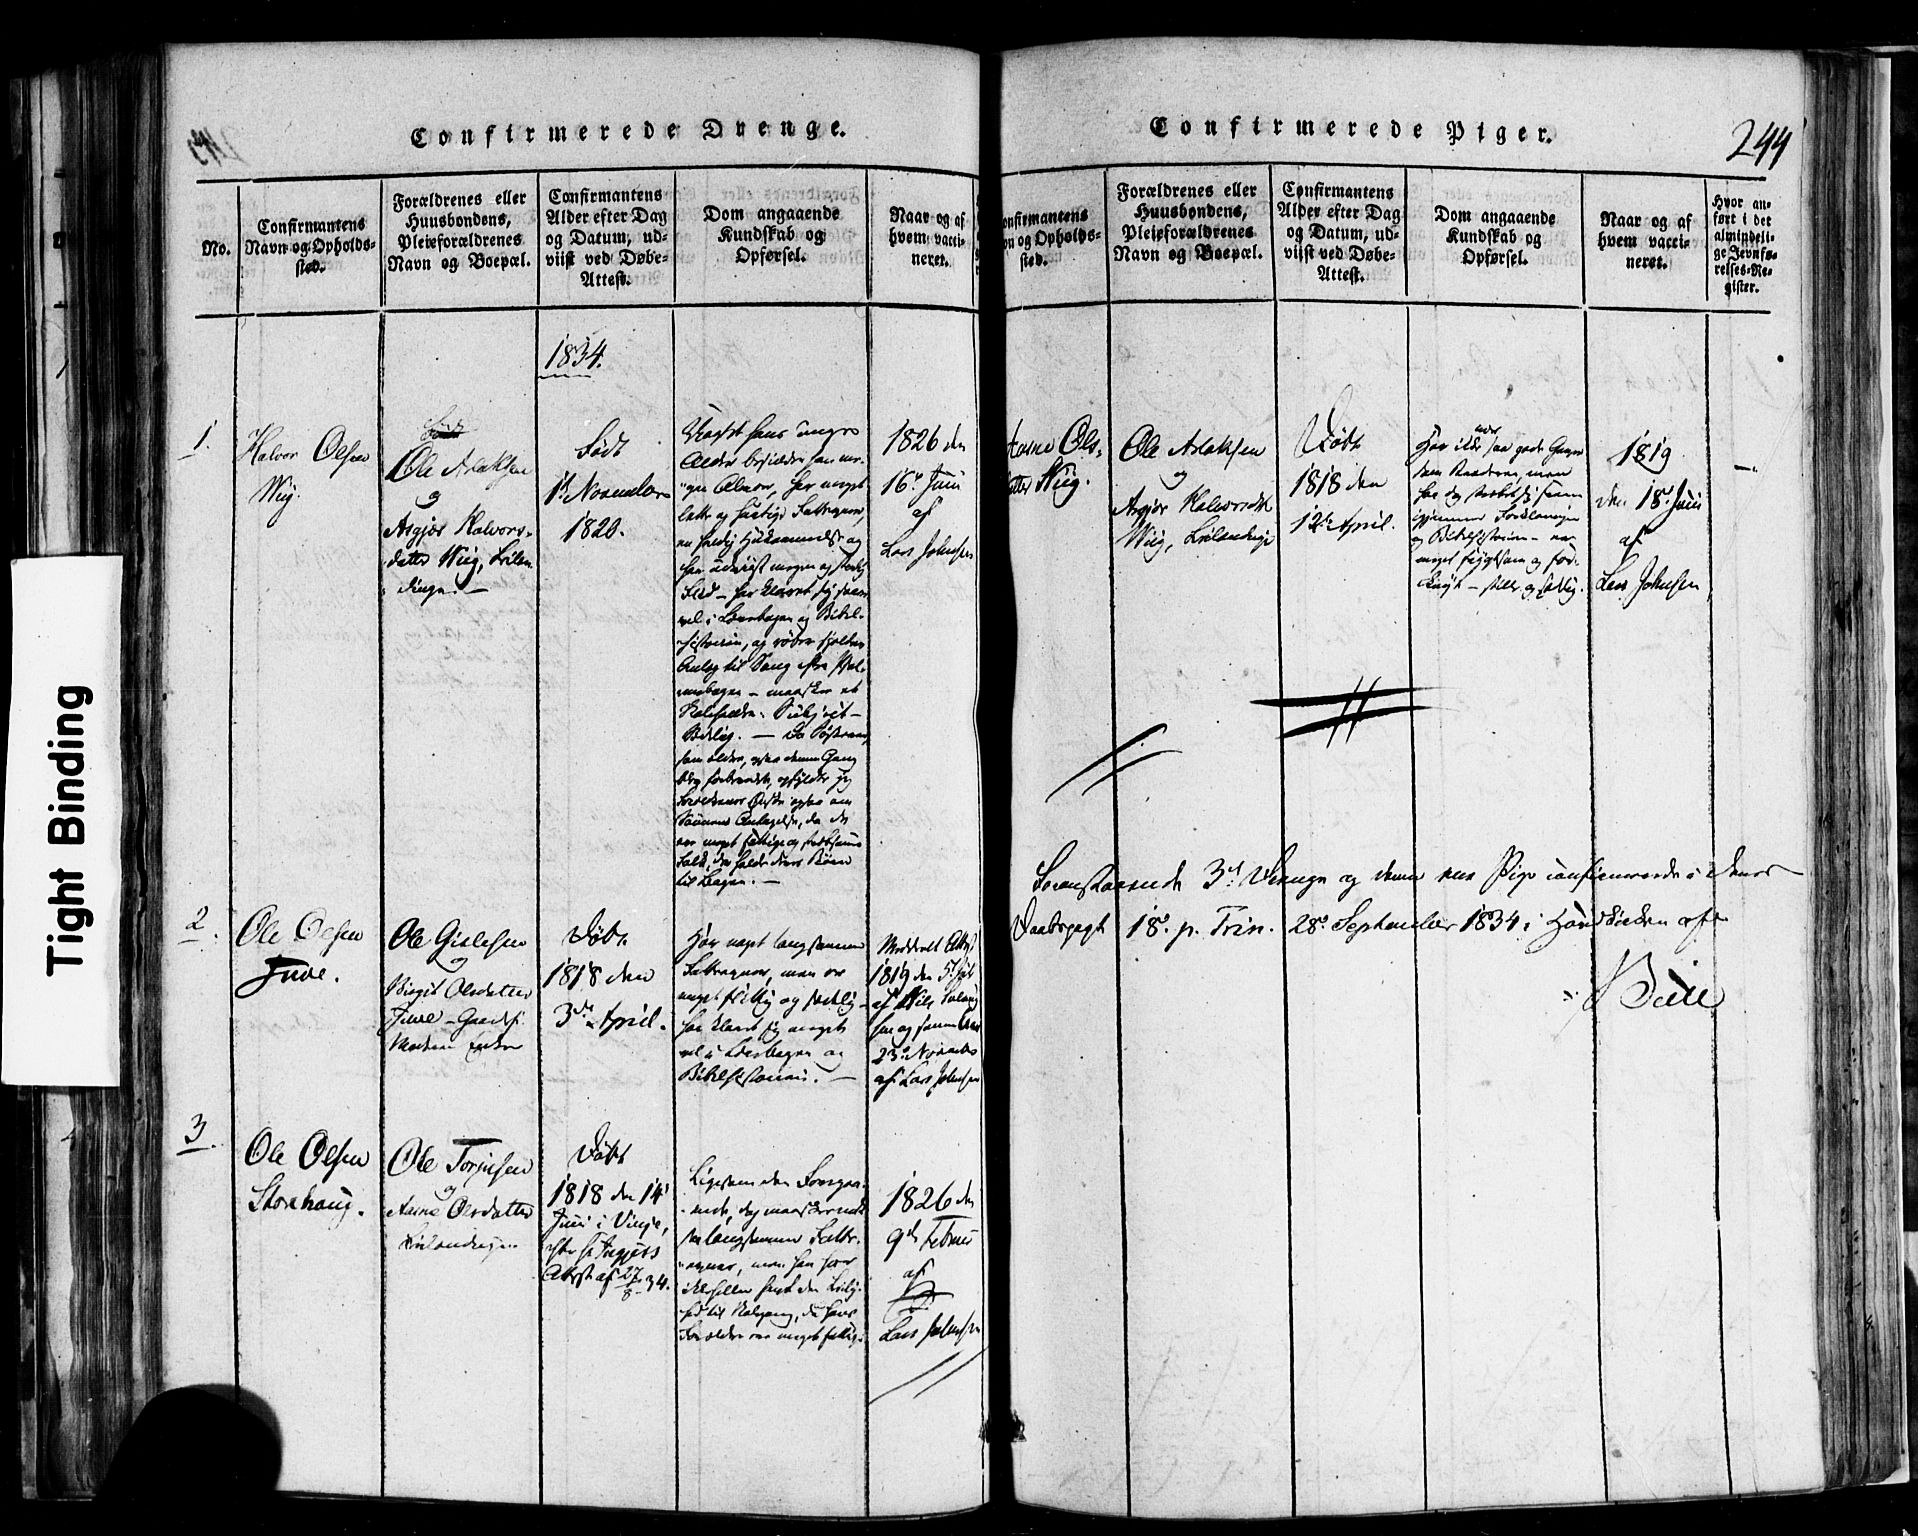 SAKO, Rauland kirkebøker, F/Fa/L0002: Ministerialbok nr. 2, 1815-1860, s. 244